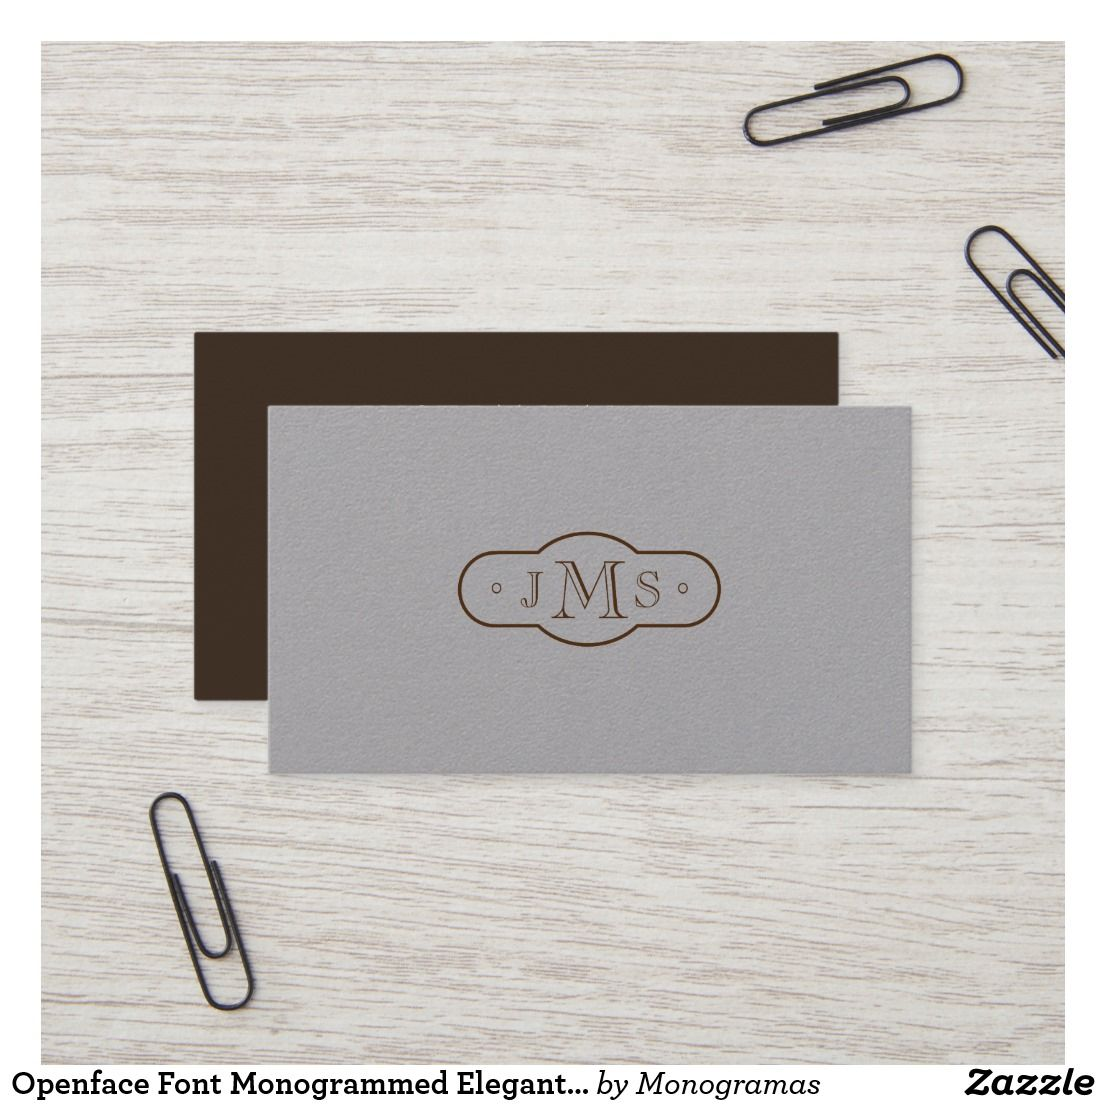 openface font monogrammed elegant retro business card